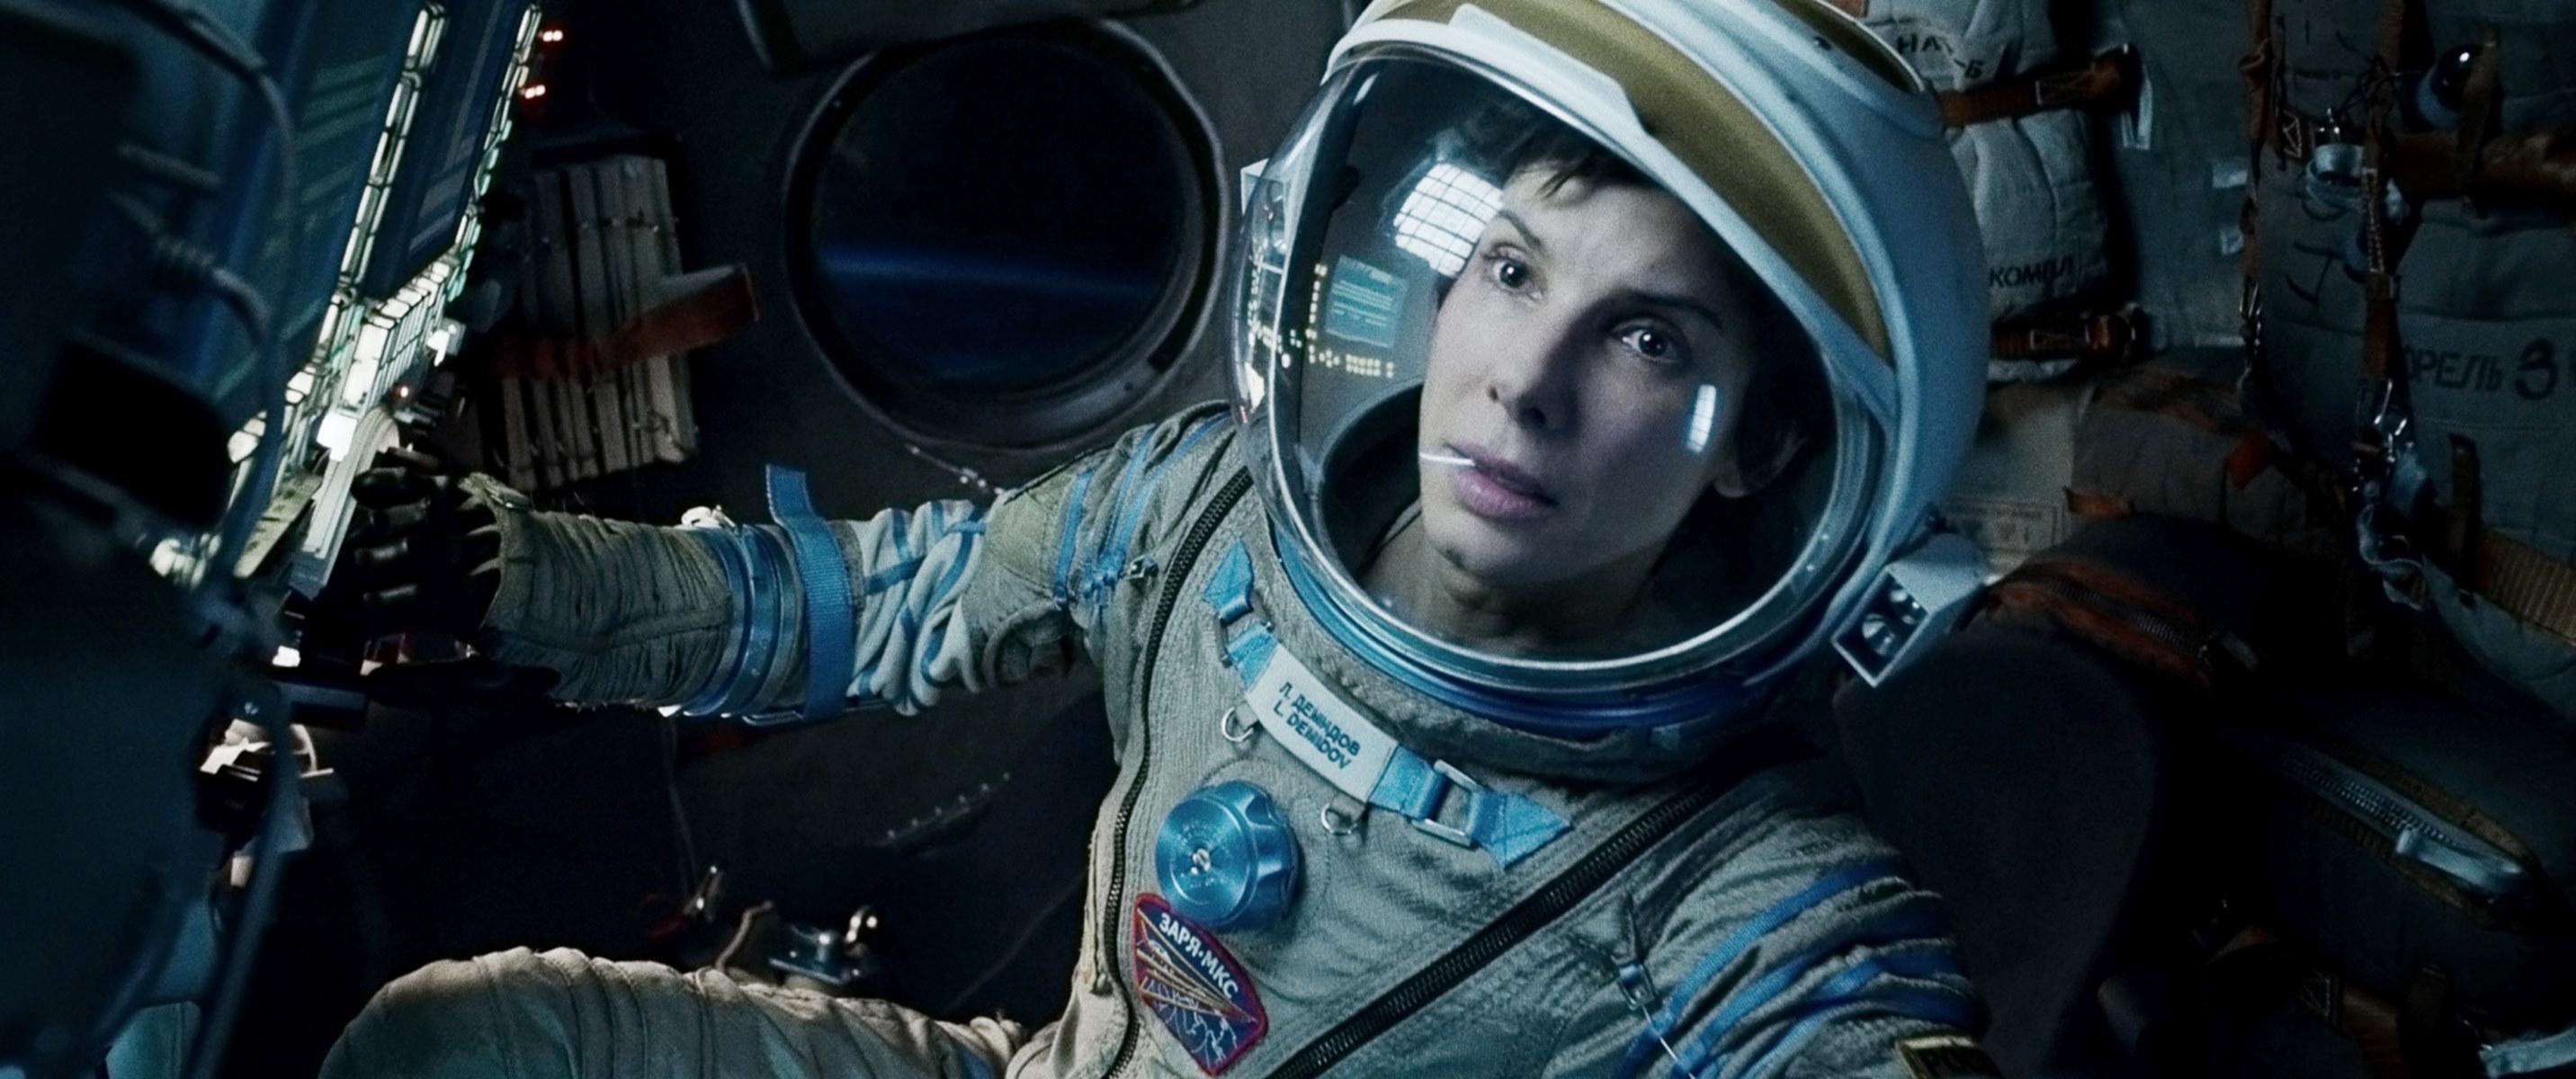 Sandra Bullock as an astronaut in space